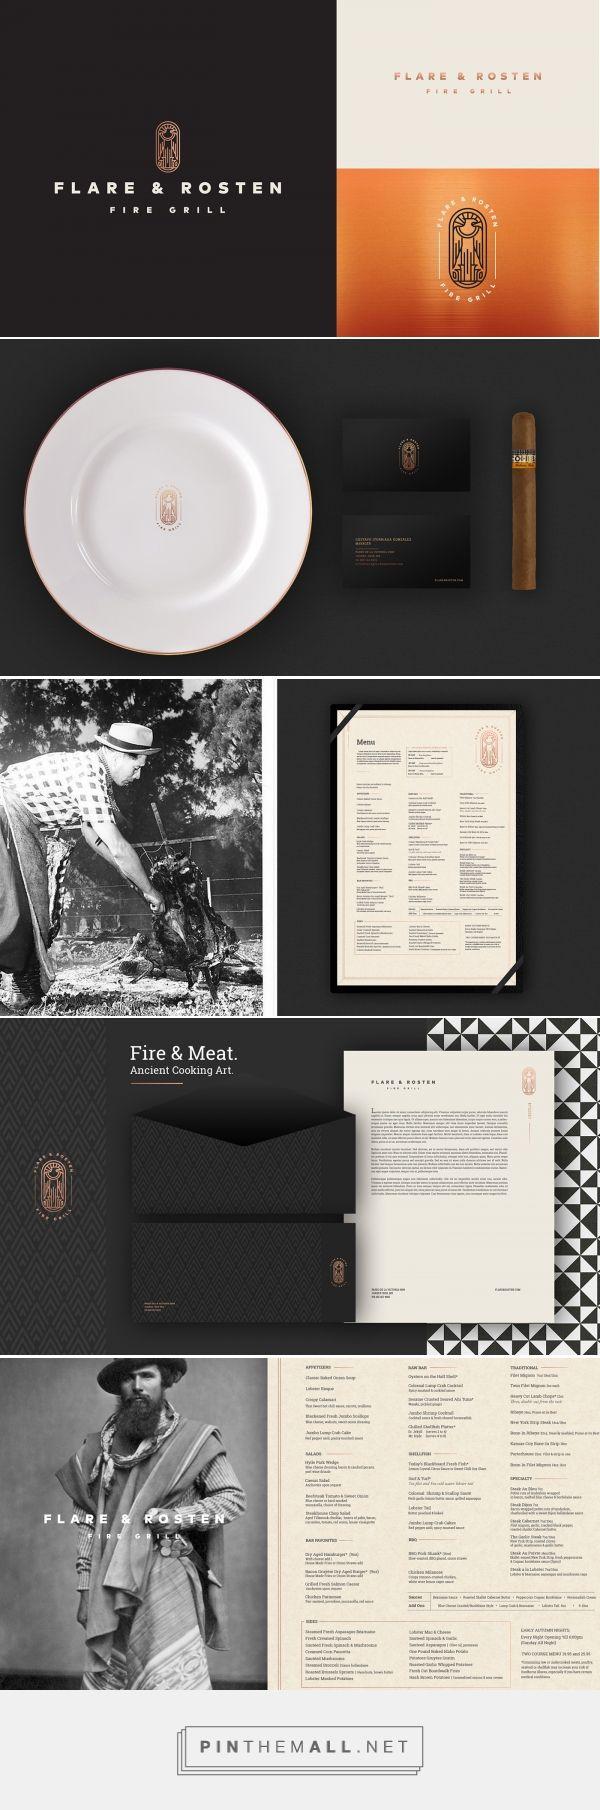 Flare & Rosten Fire Grill Restaurant Branding and Menu Design by Jaime Espinoza   Fivestar Branding Agency – Design and Branding Agency & Curated Inspiration Gallery